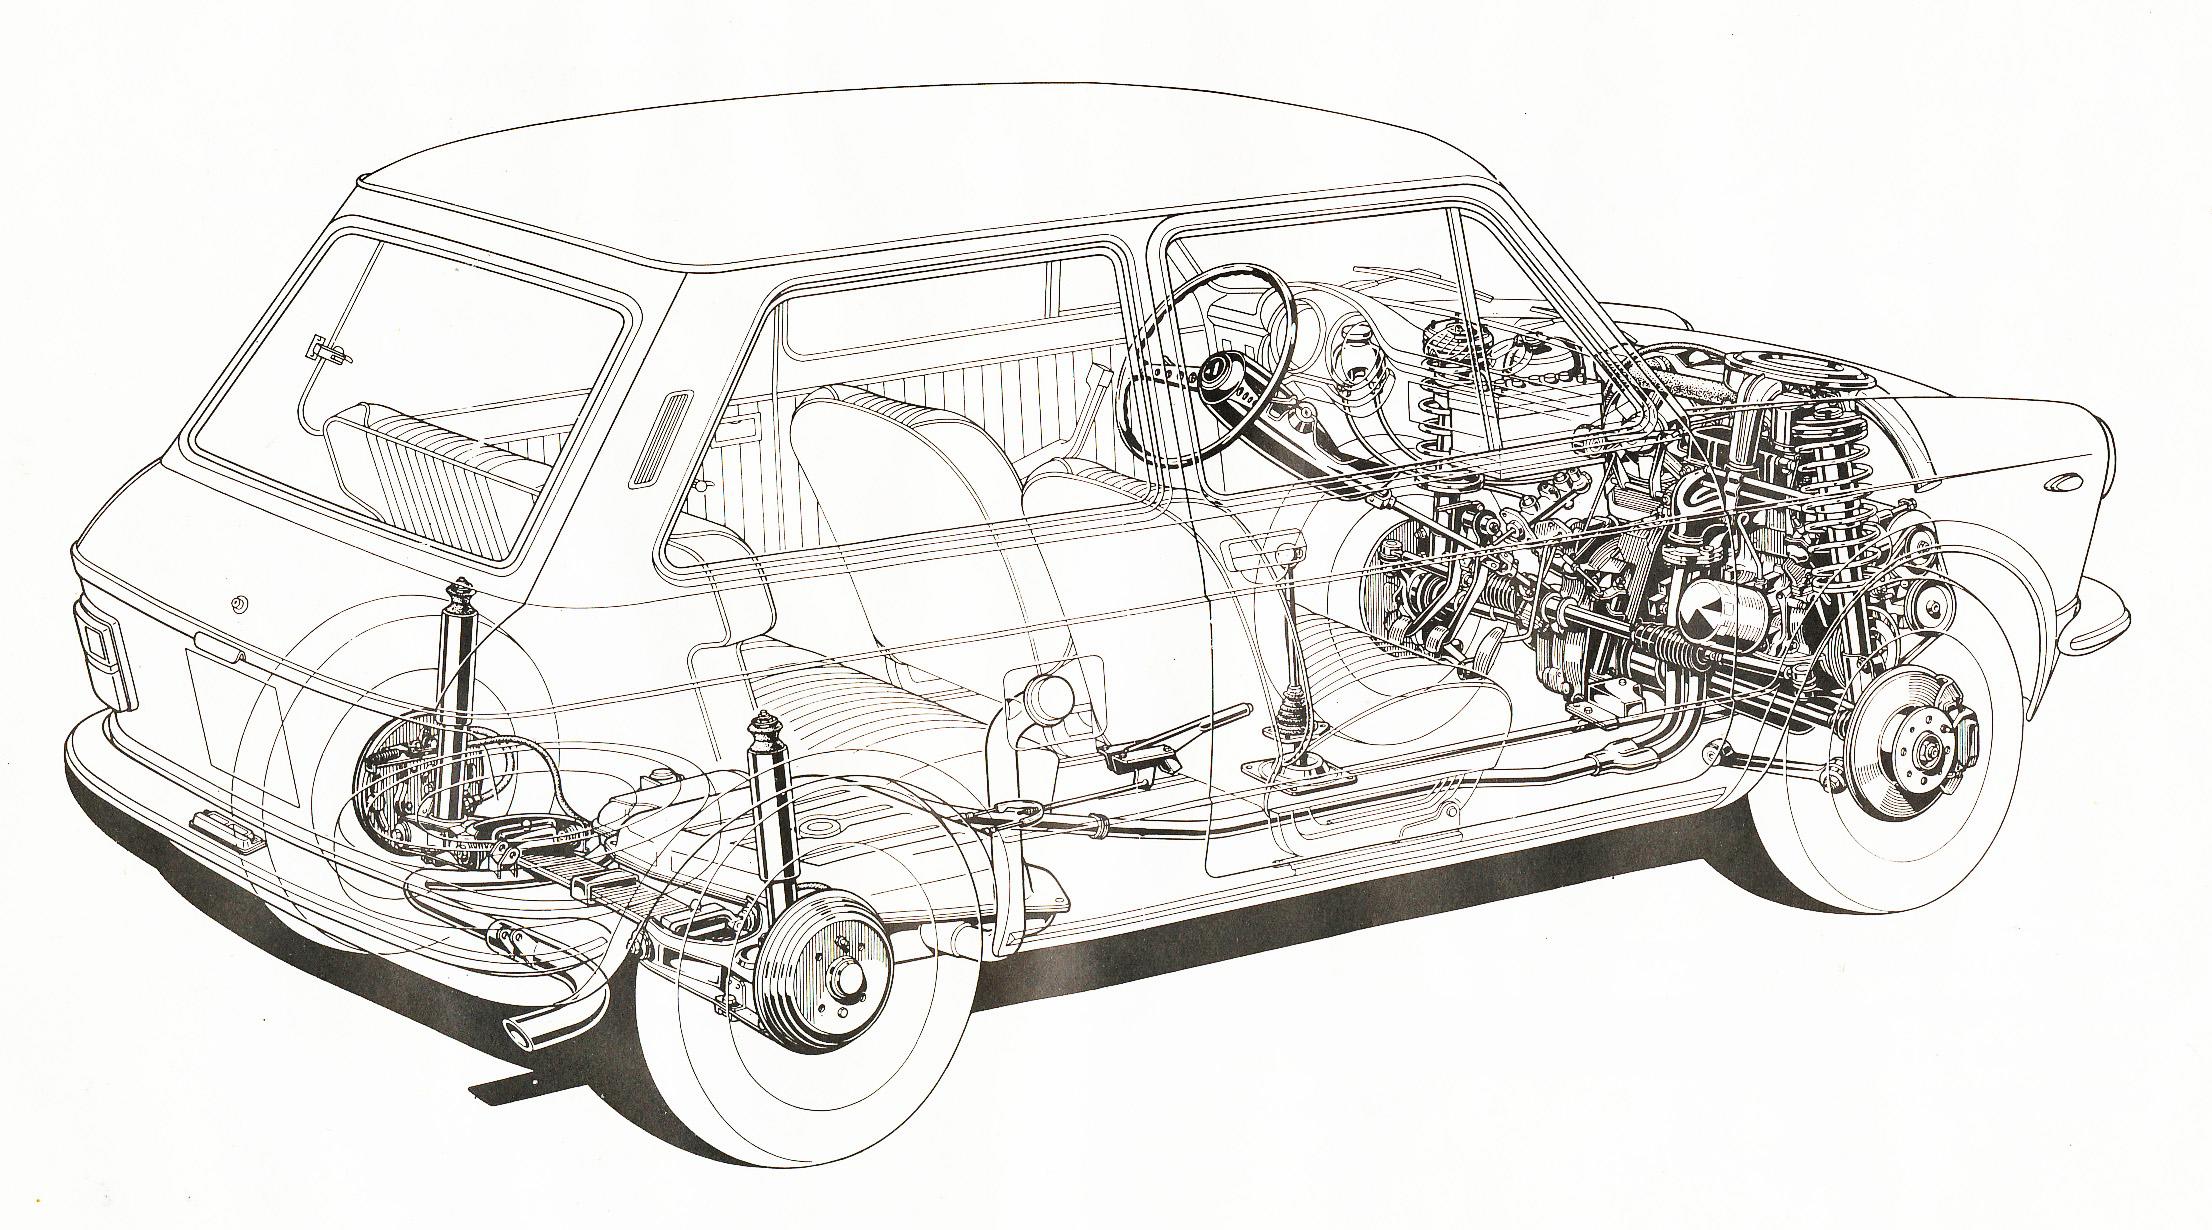 Autobianchi A112 blueprint